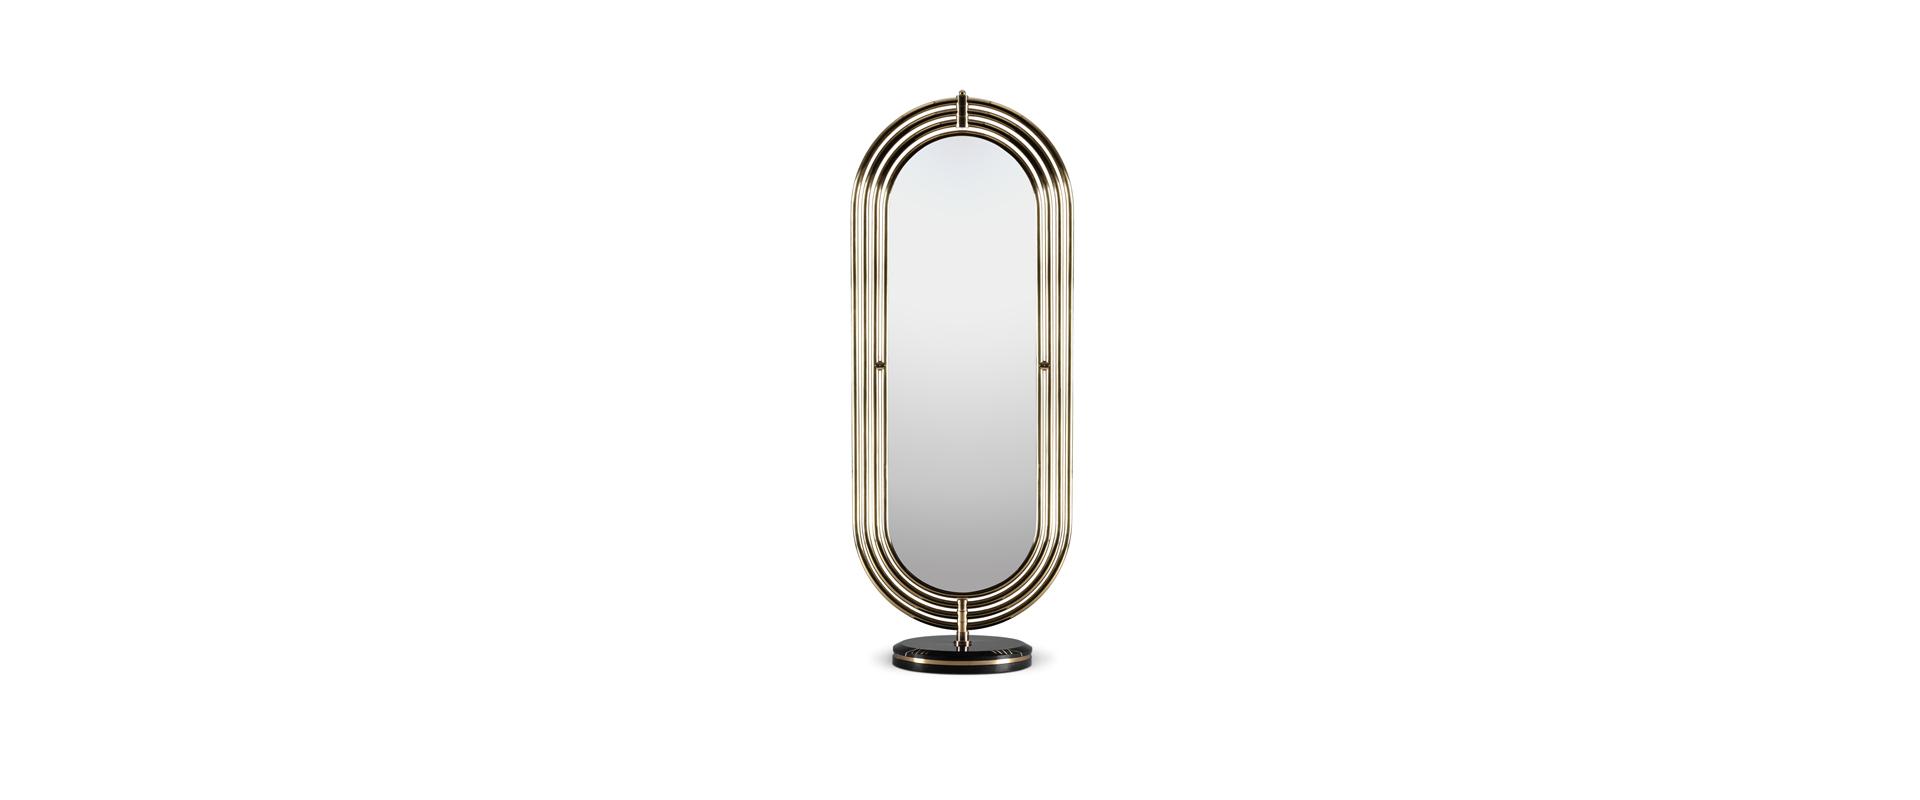 Bathroom Design Essentials: Elements To Own